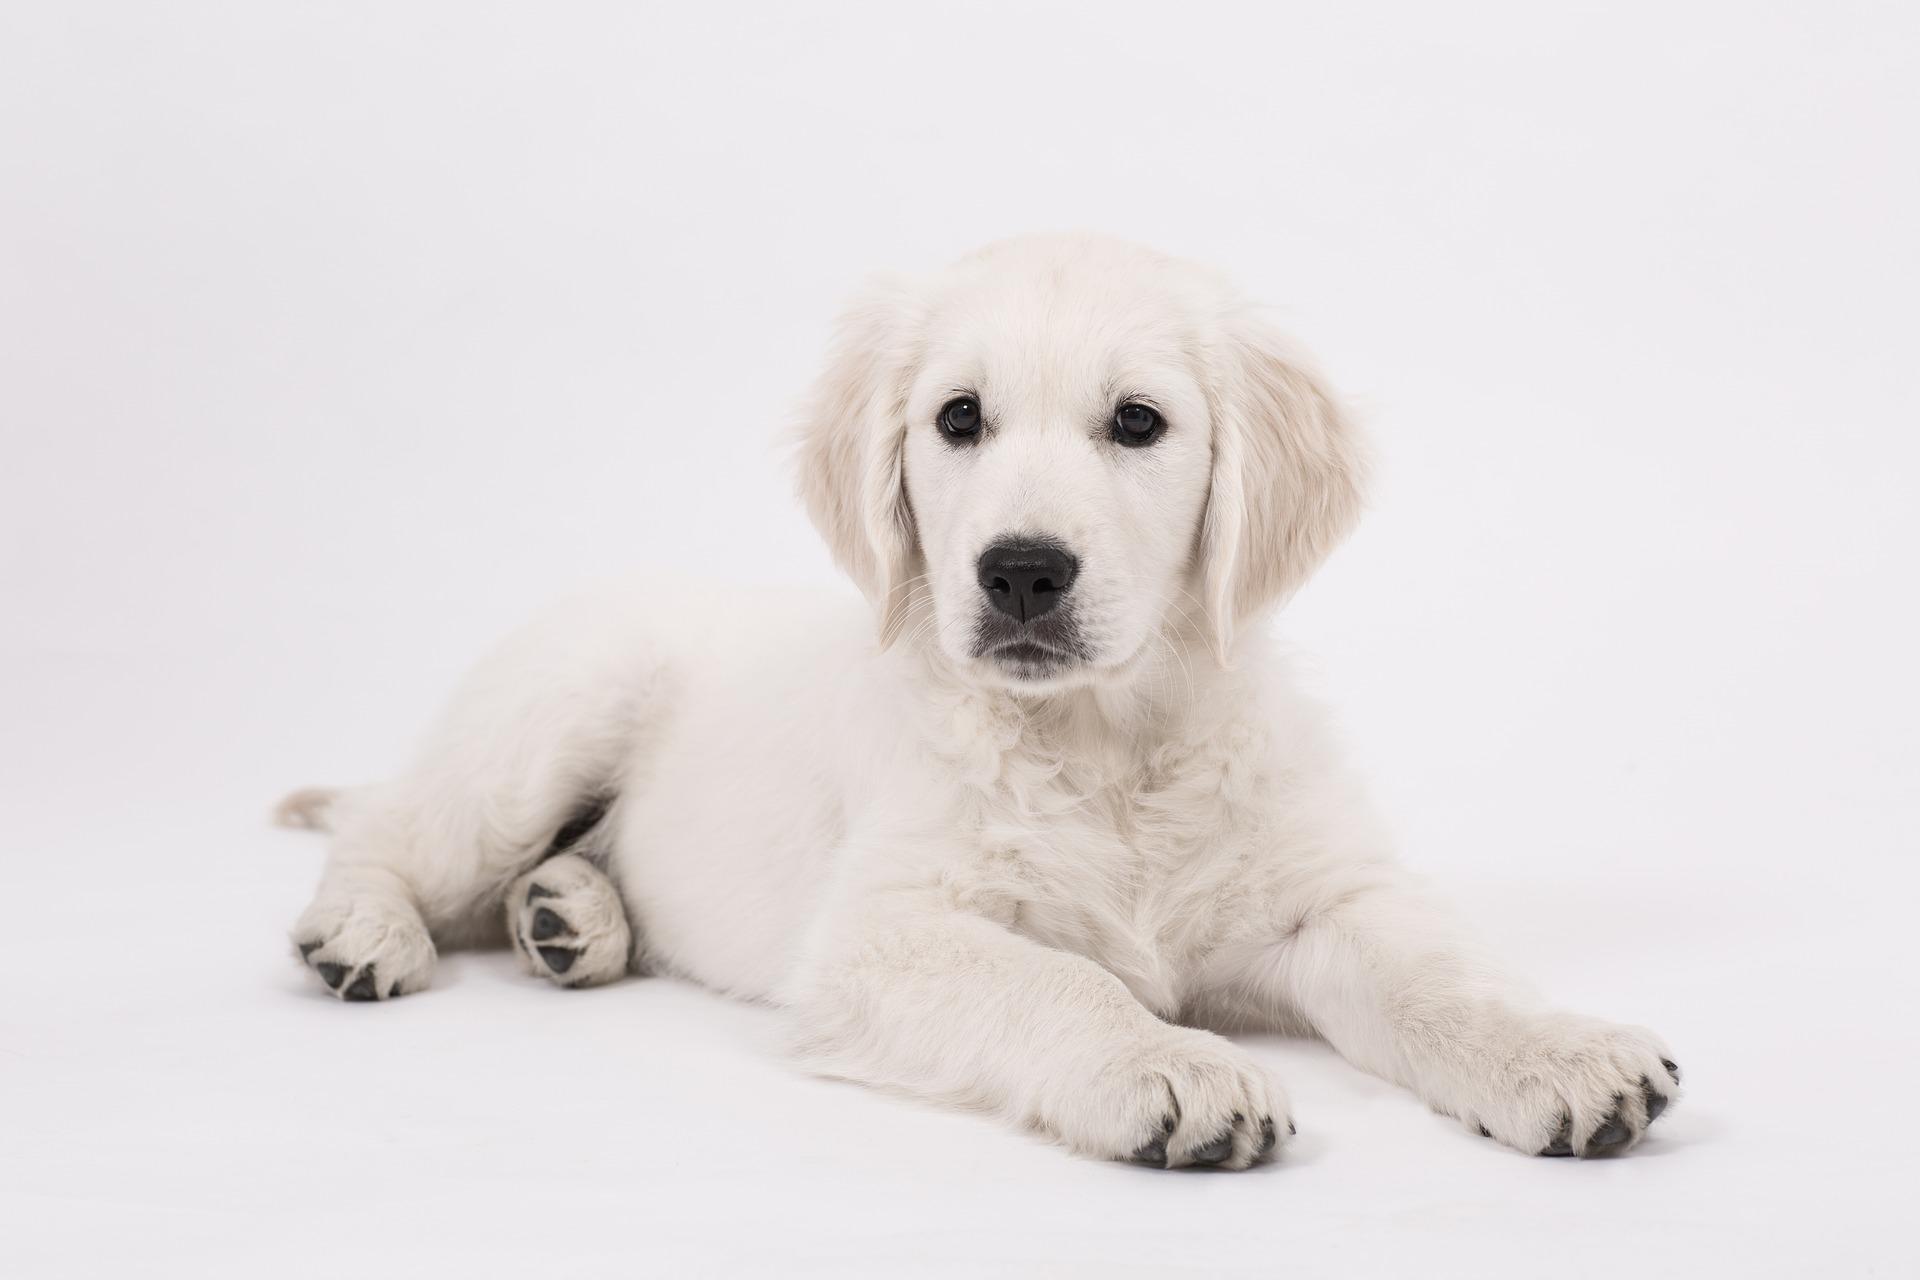 Servei de medicina veterinaria a farmàcia Caldes de Malavella - Farmàcia Xènia Planas